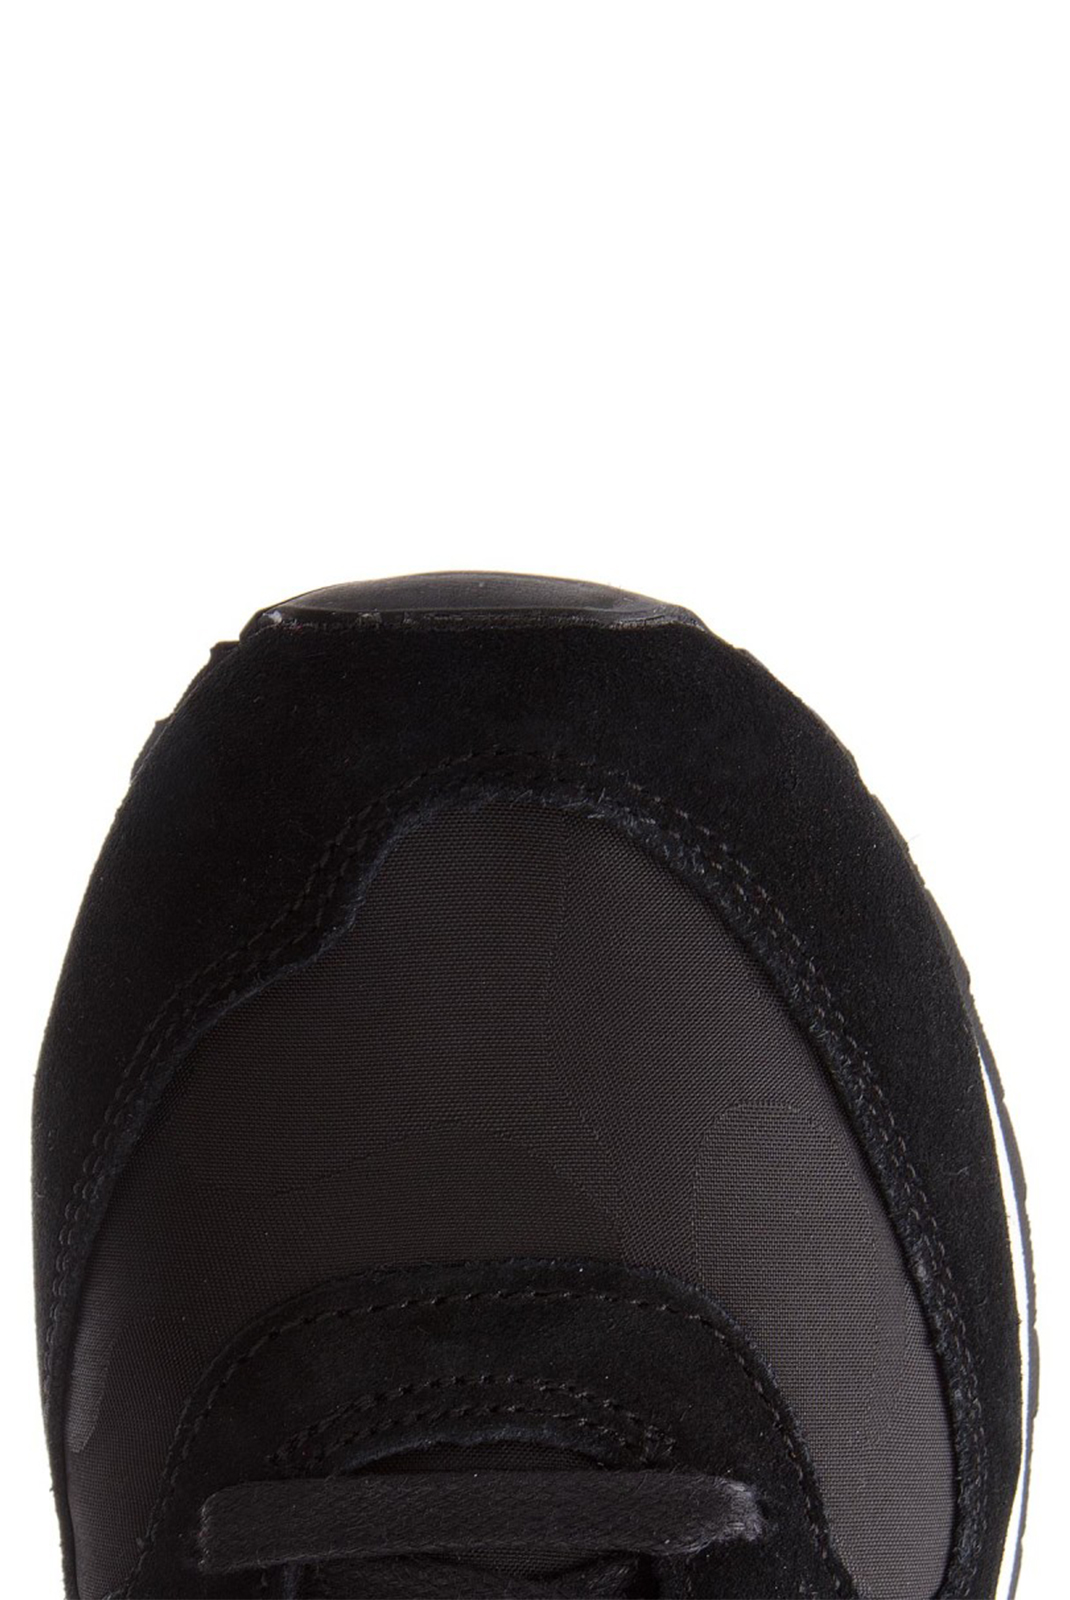 Baskets / Sport  Guess jeans FMCRL3 SUP12 CHARLIE BLACK